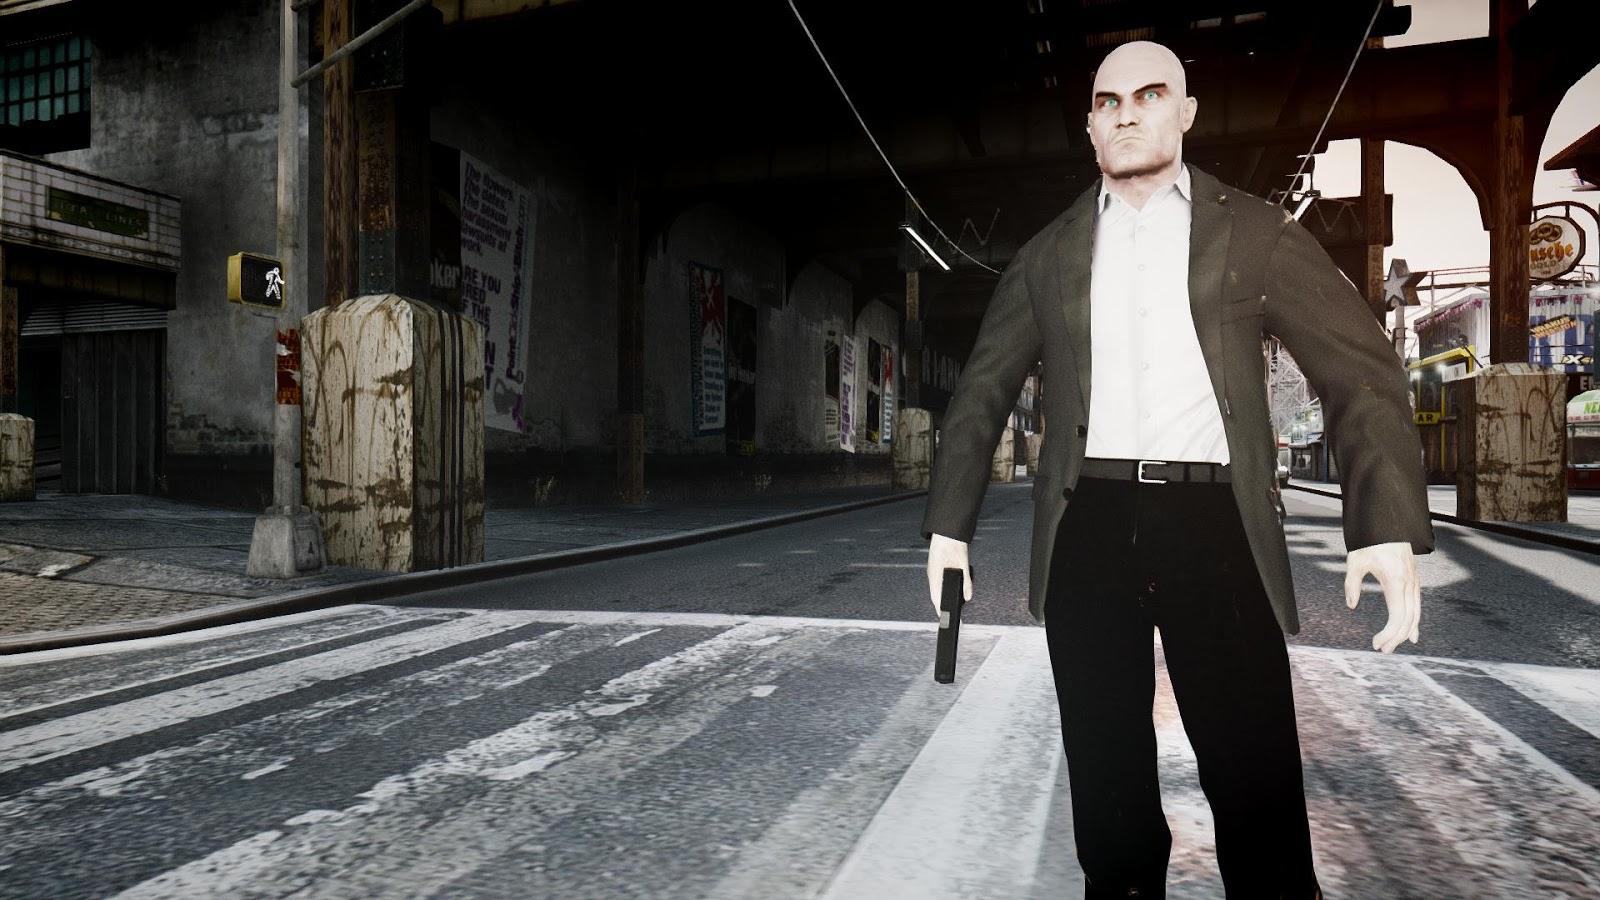 GTA 5,GTAV,GTA IV Mods and Skins: Hitman Absolution Pack